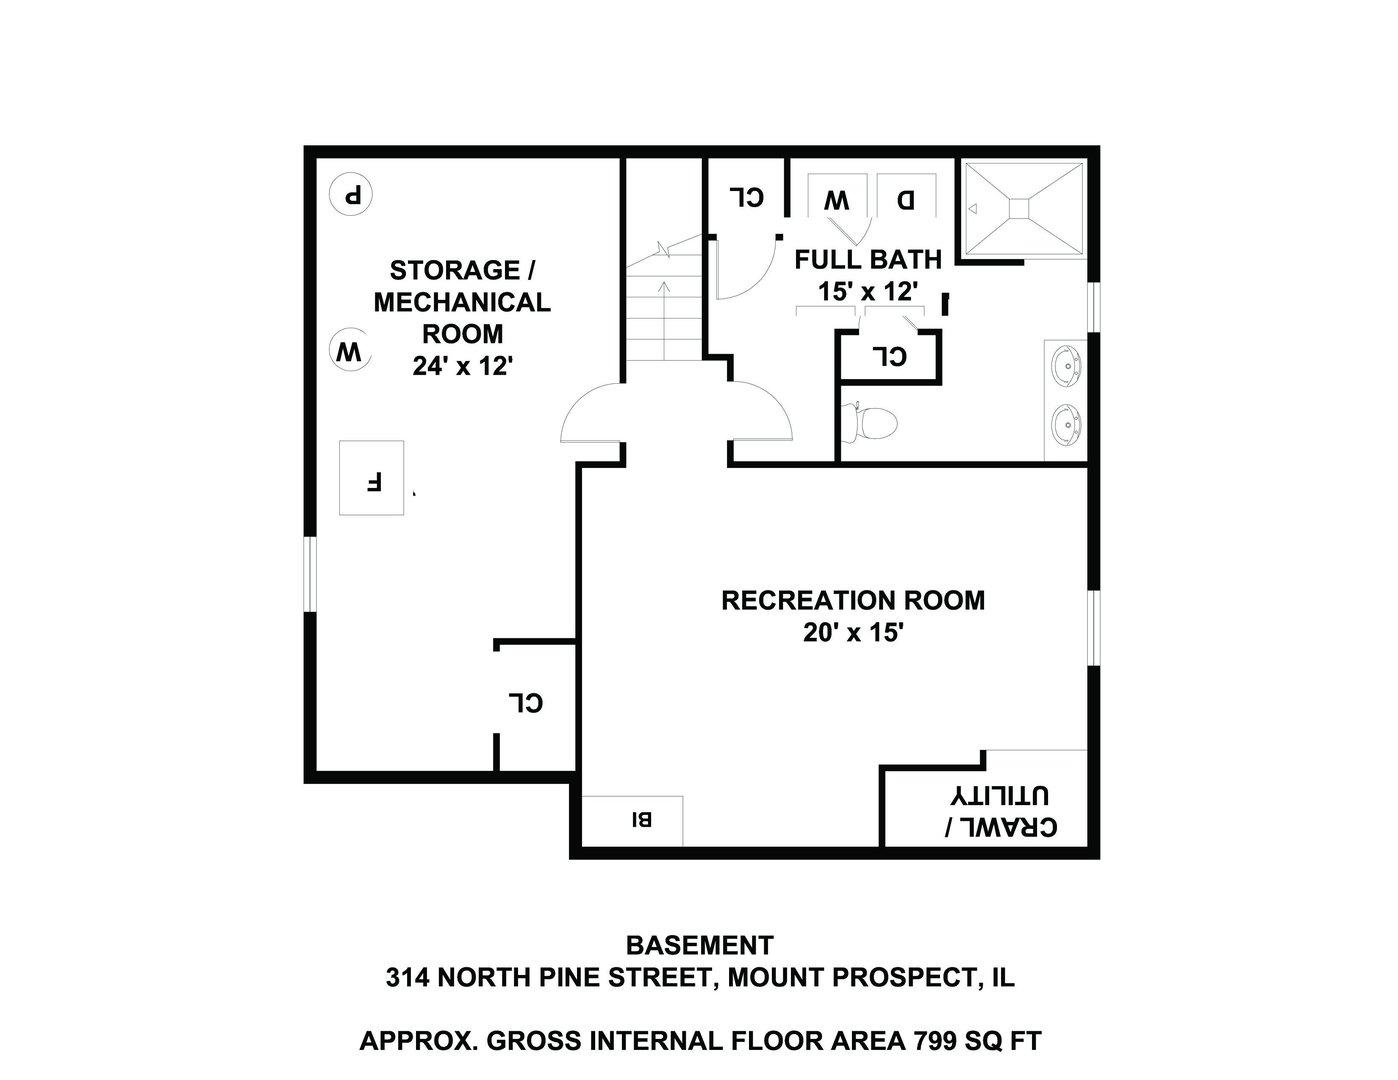 314 North Pine, Mount Prospect, Illinois, 60056